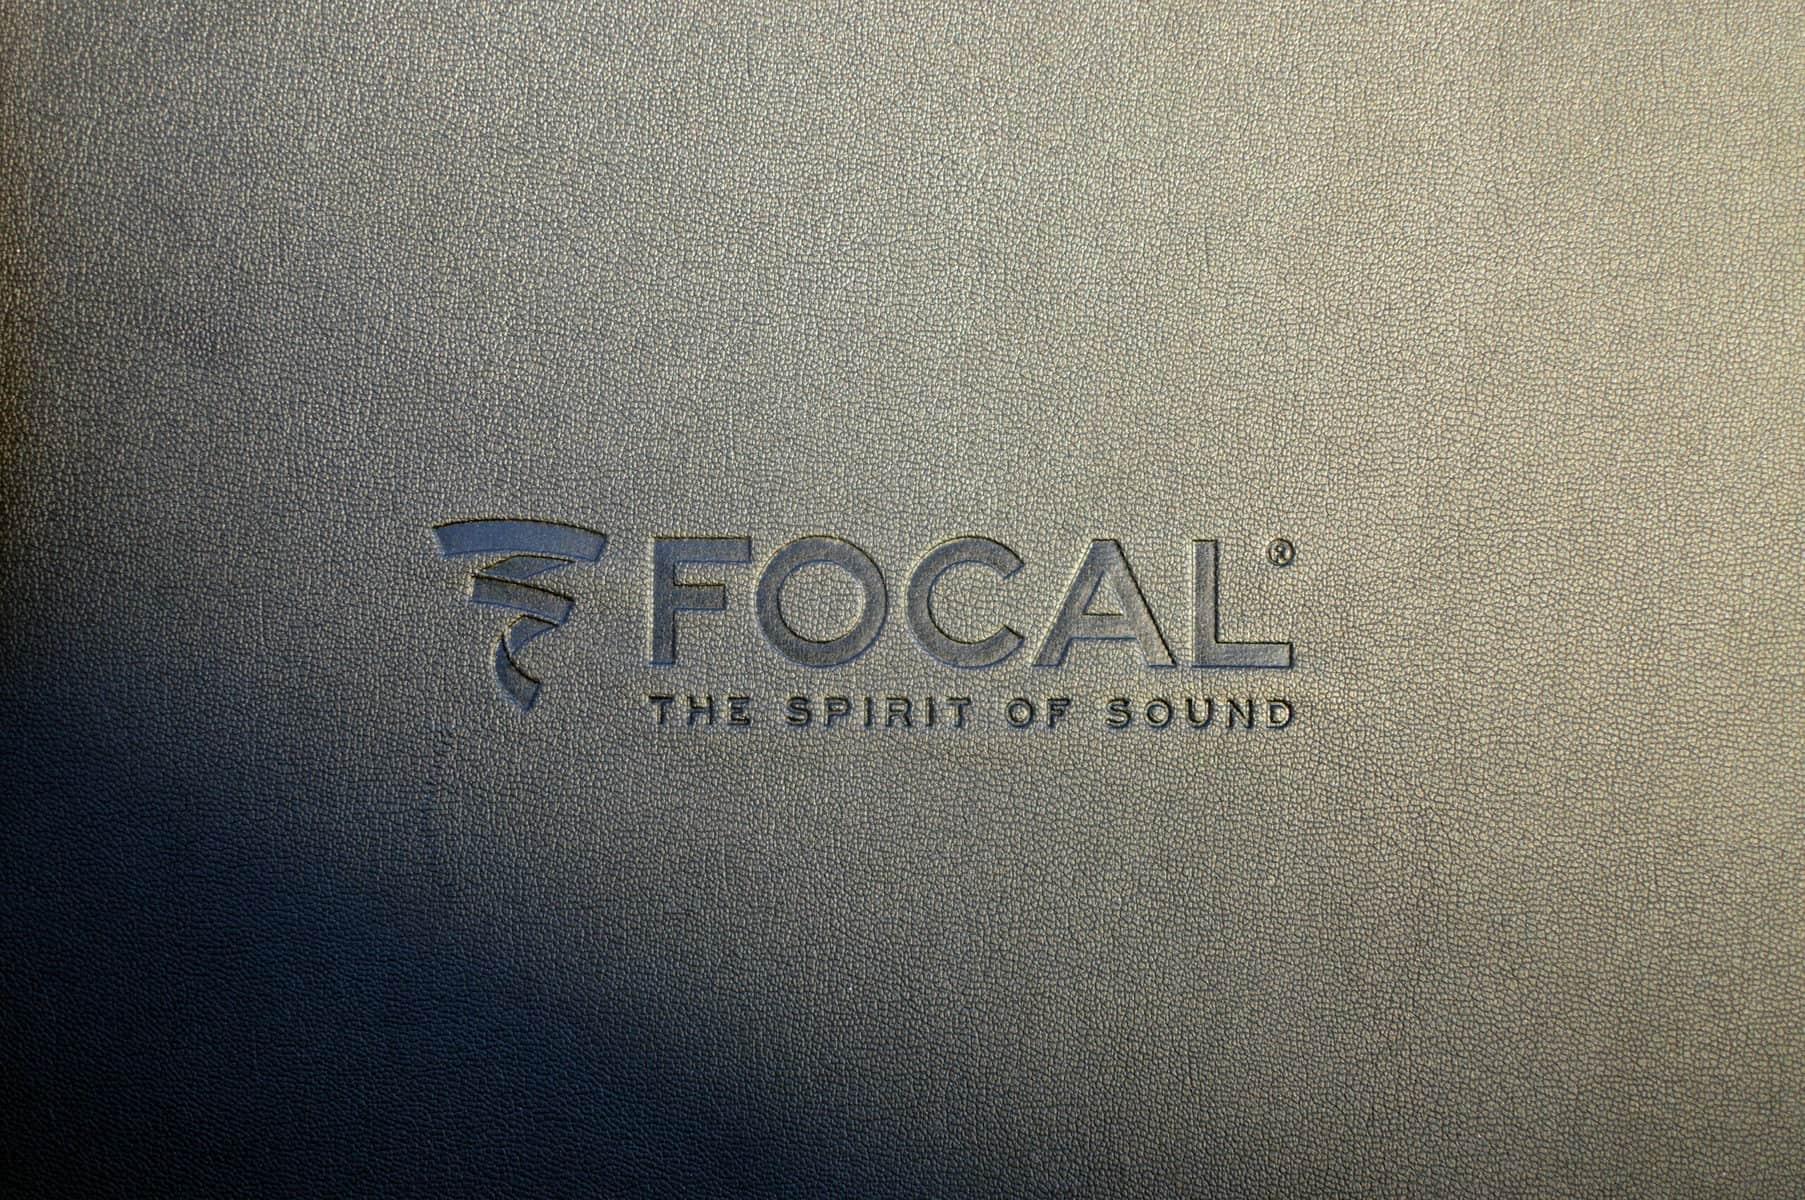 Focal Utopia Review